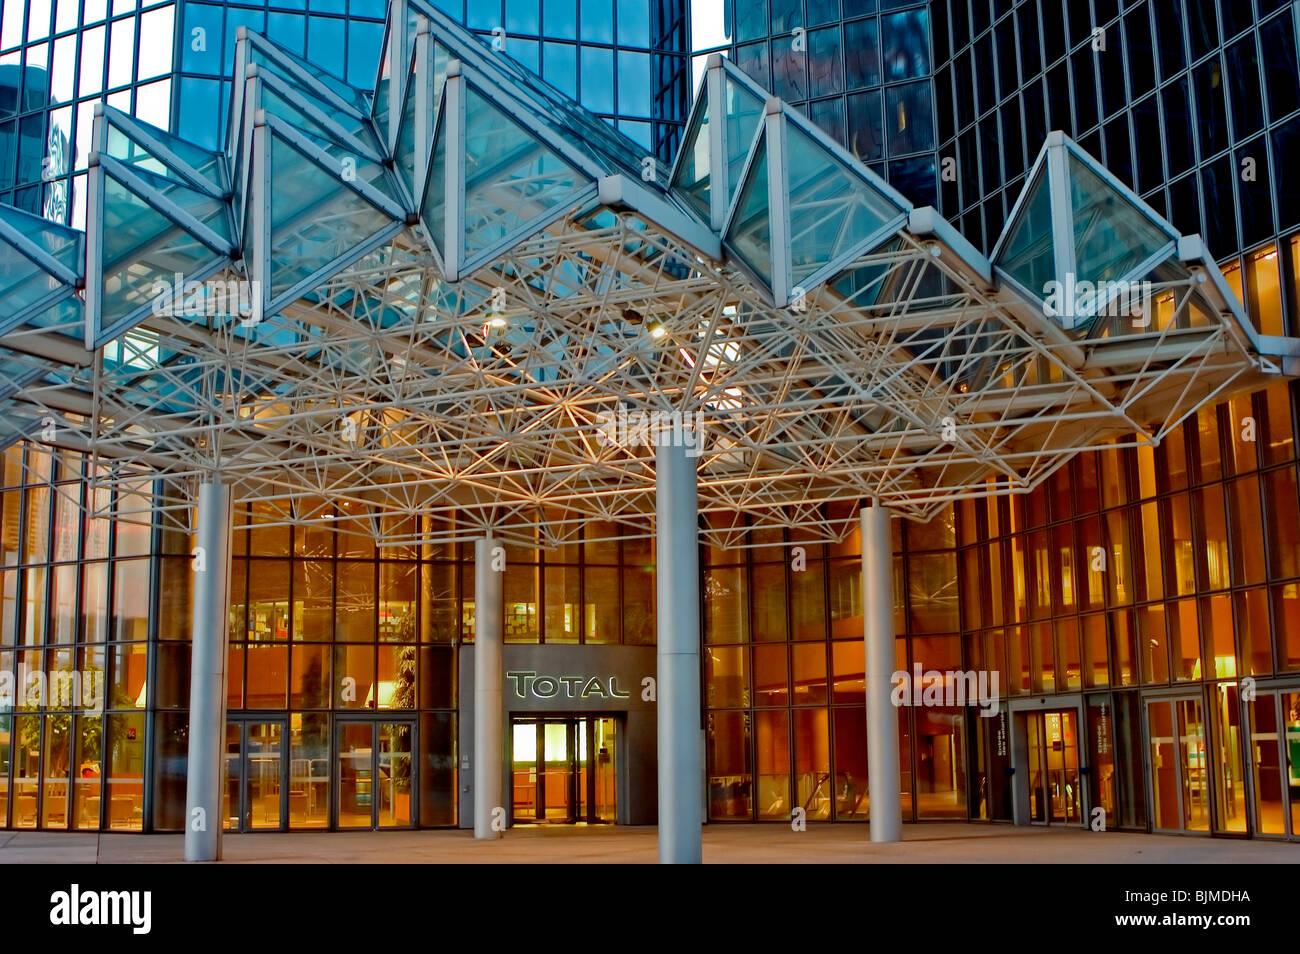 Paris, France, La Défense Business Center, Total Corporate Headquarters at Night. Detail, Entrance - Stock Image